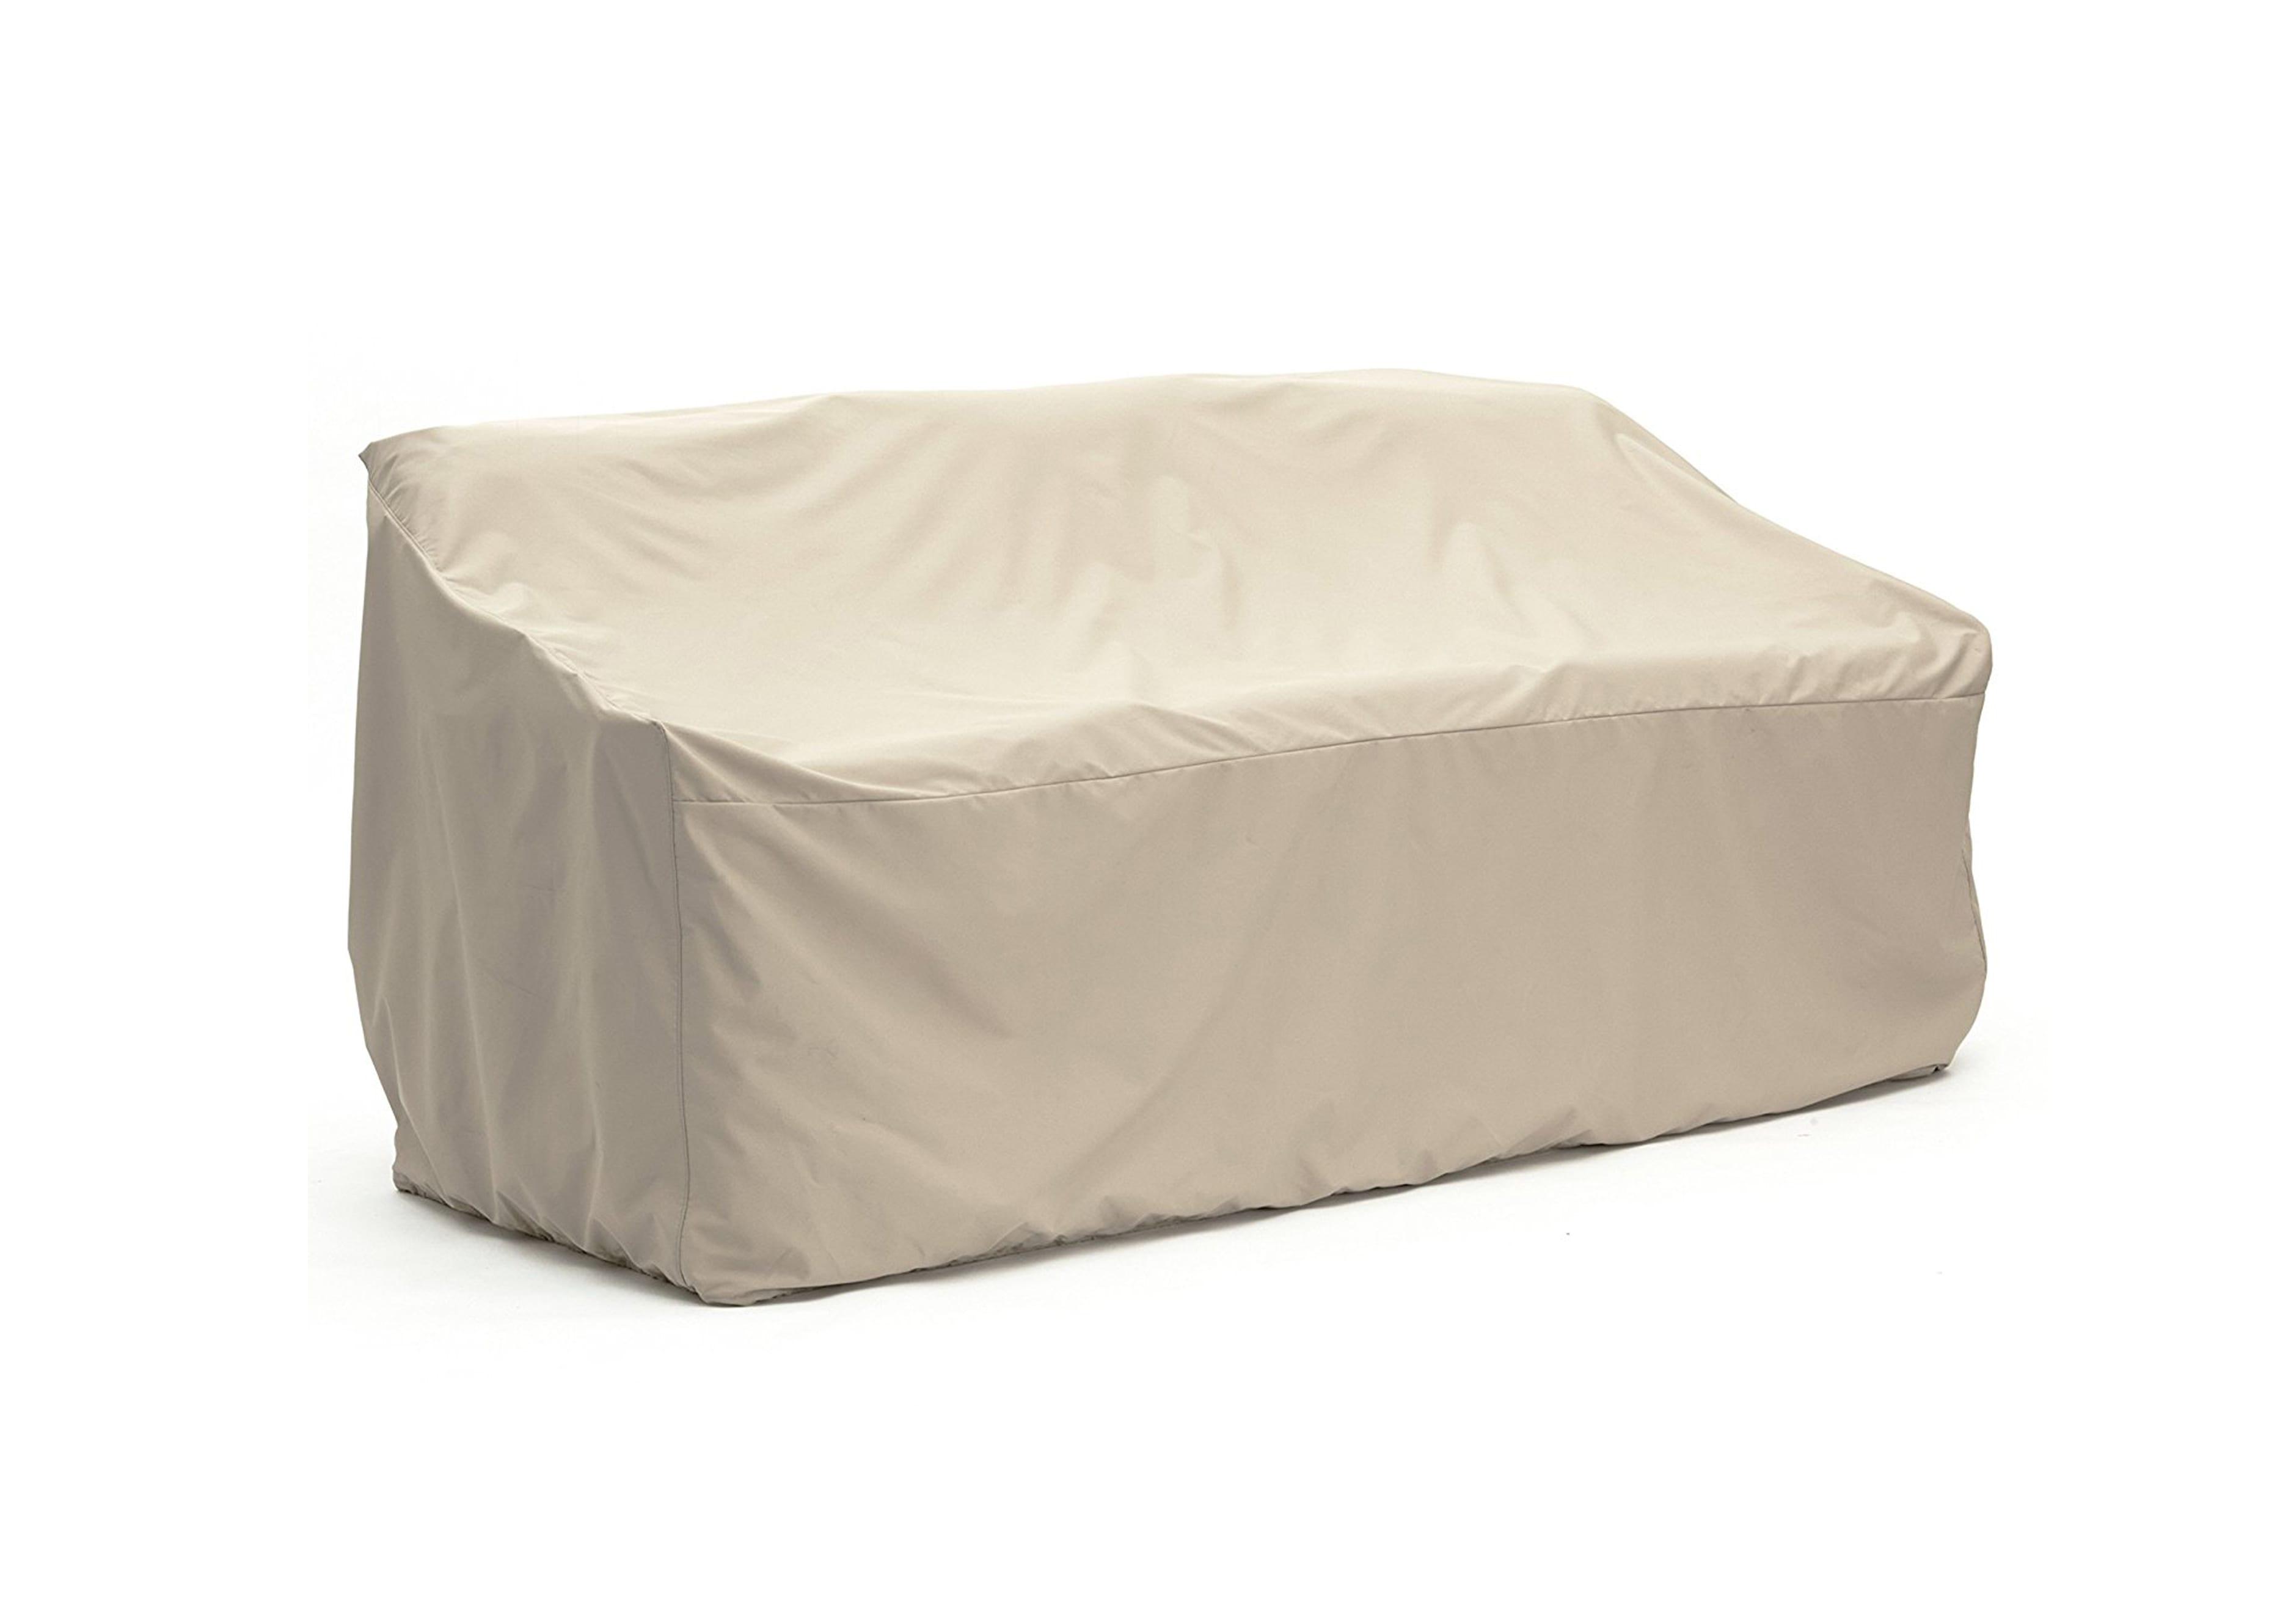 Rattan kerti bútor, kanapé takaróponyva